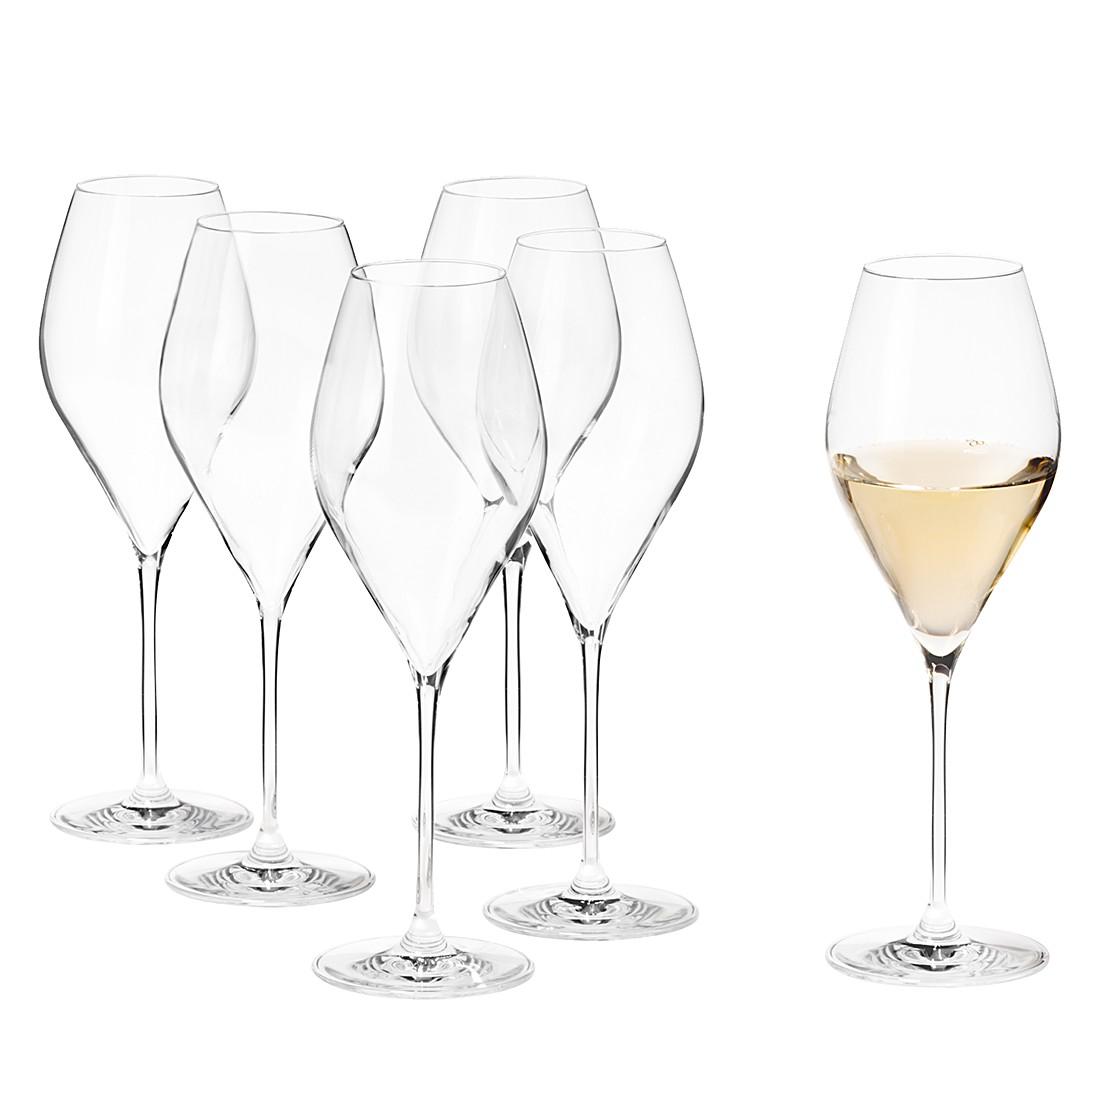 Weißweinglas XL Rossini (6er-Set) – Klar, Leonardo jetzt bestellen